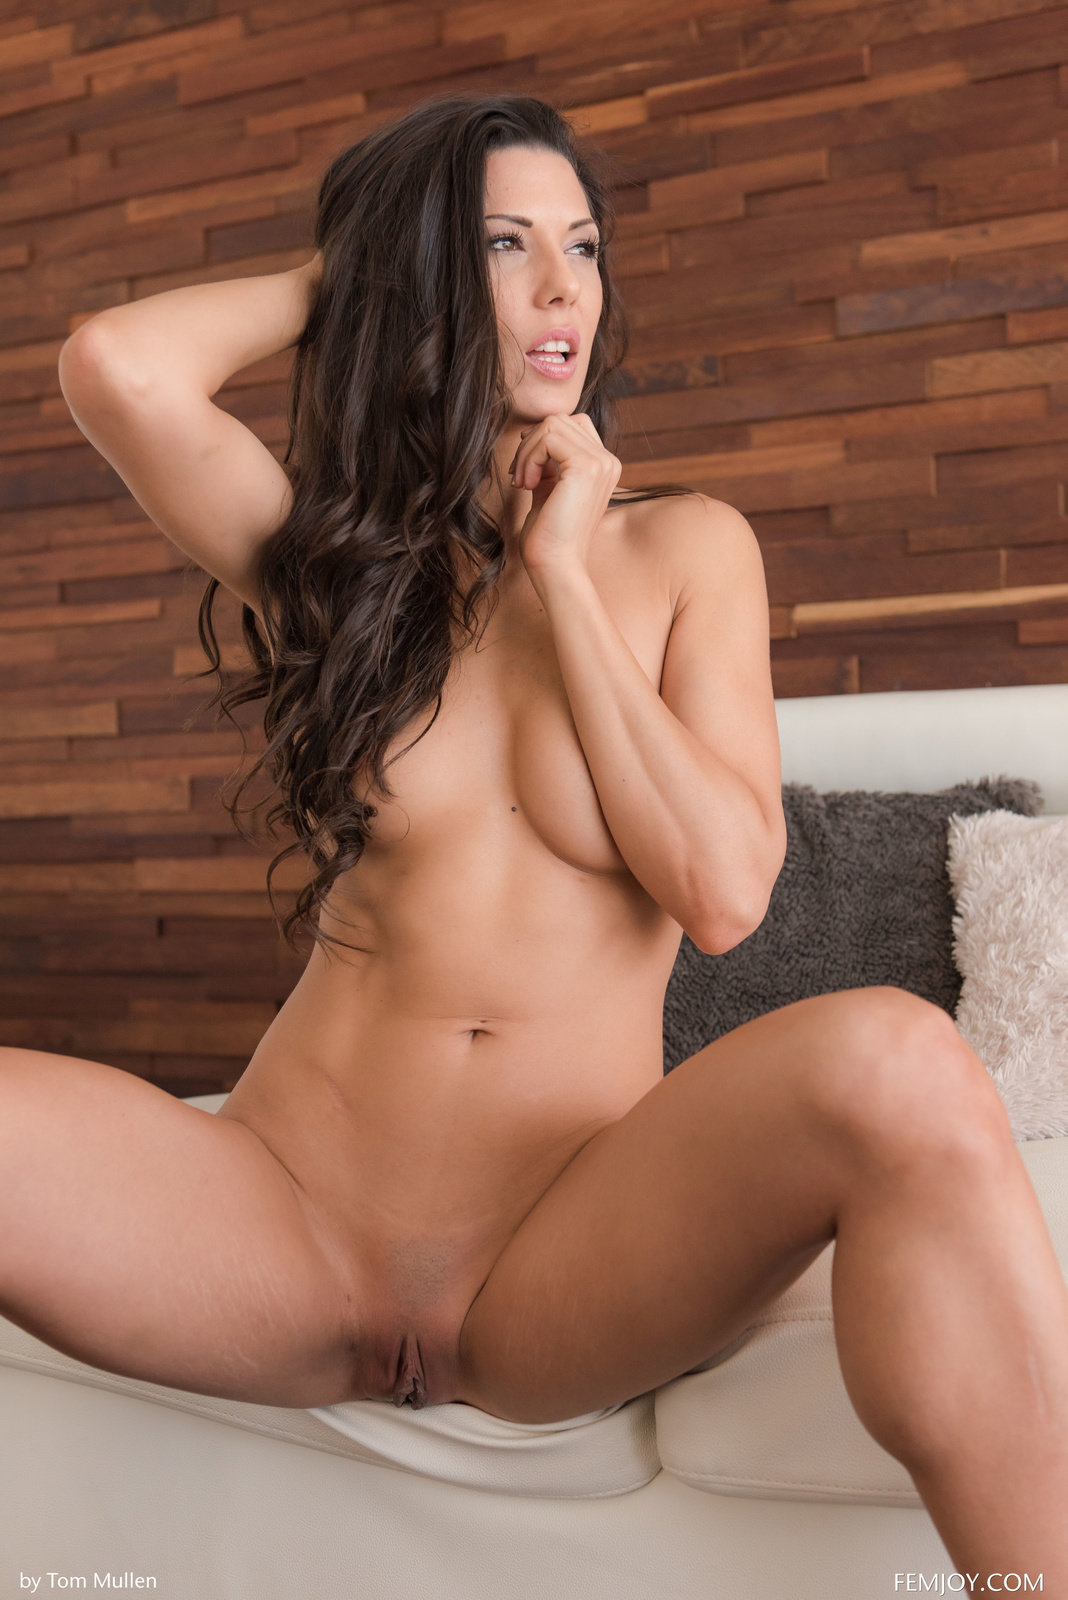 Alexa thomas nude